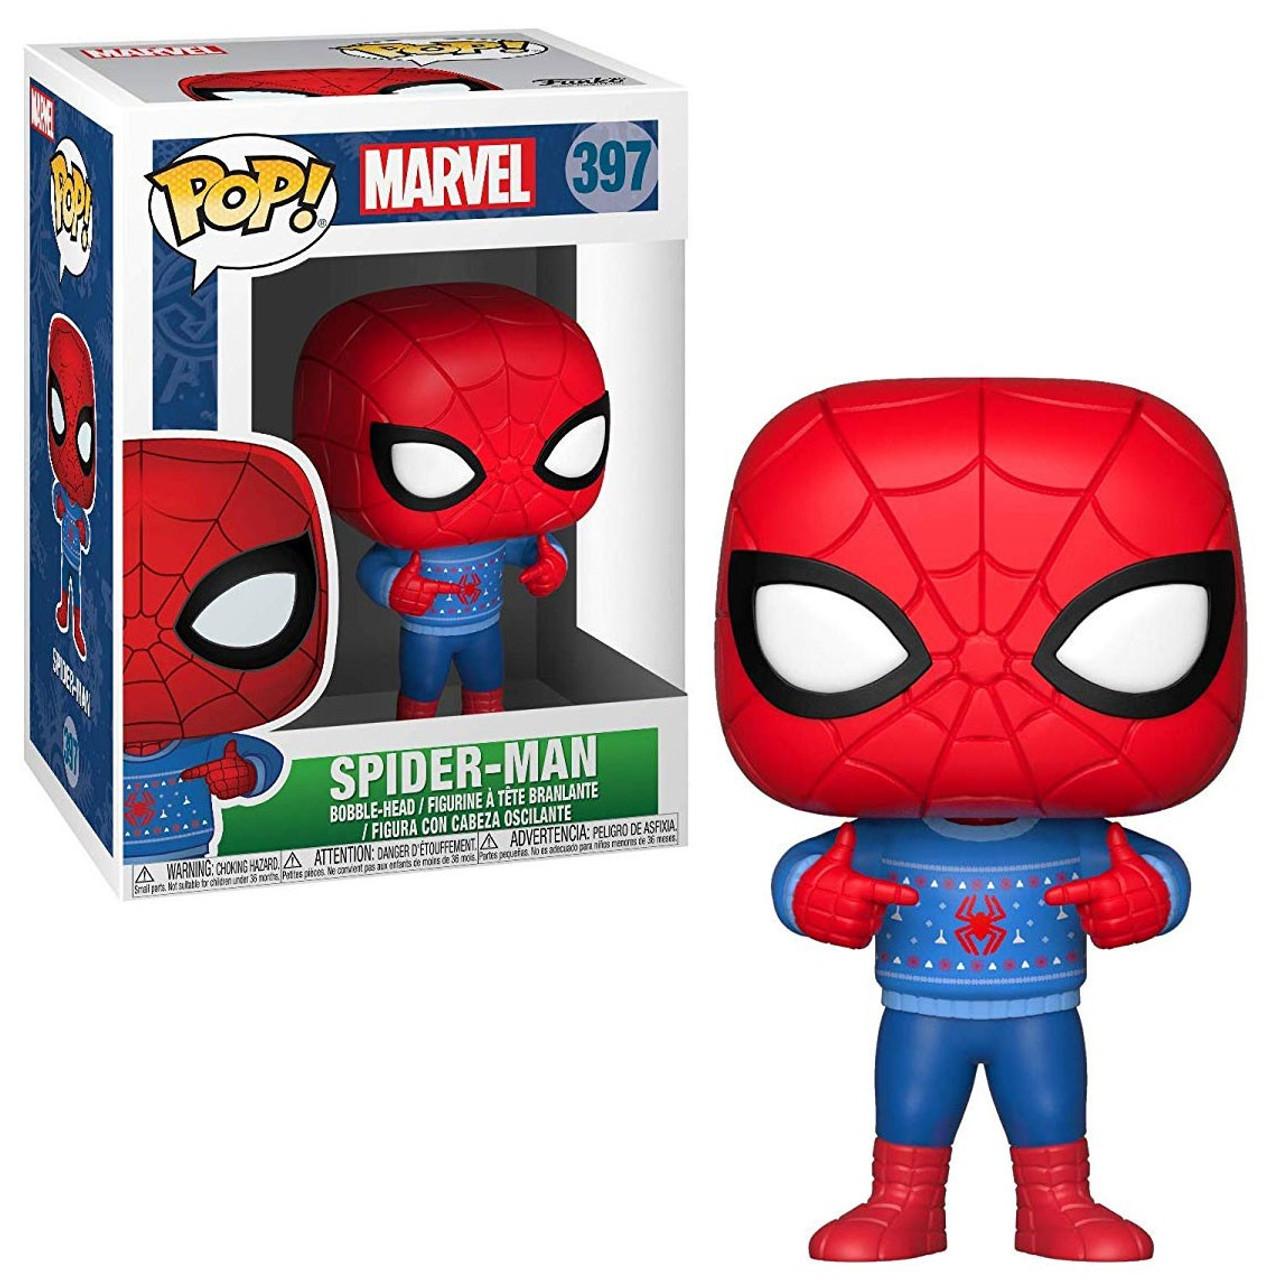 b554e42b594 Funko Marvel Universe Marvel Holiday Funko POP Marvel Spider-Man Vinyl  Figure 397 Ugly Sweater - ToyWiz